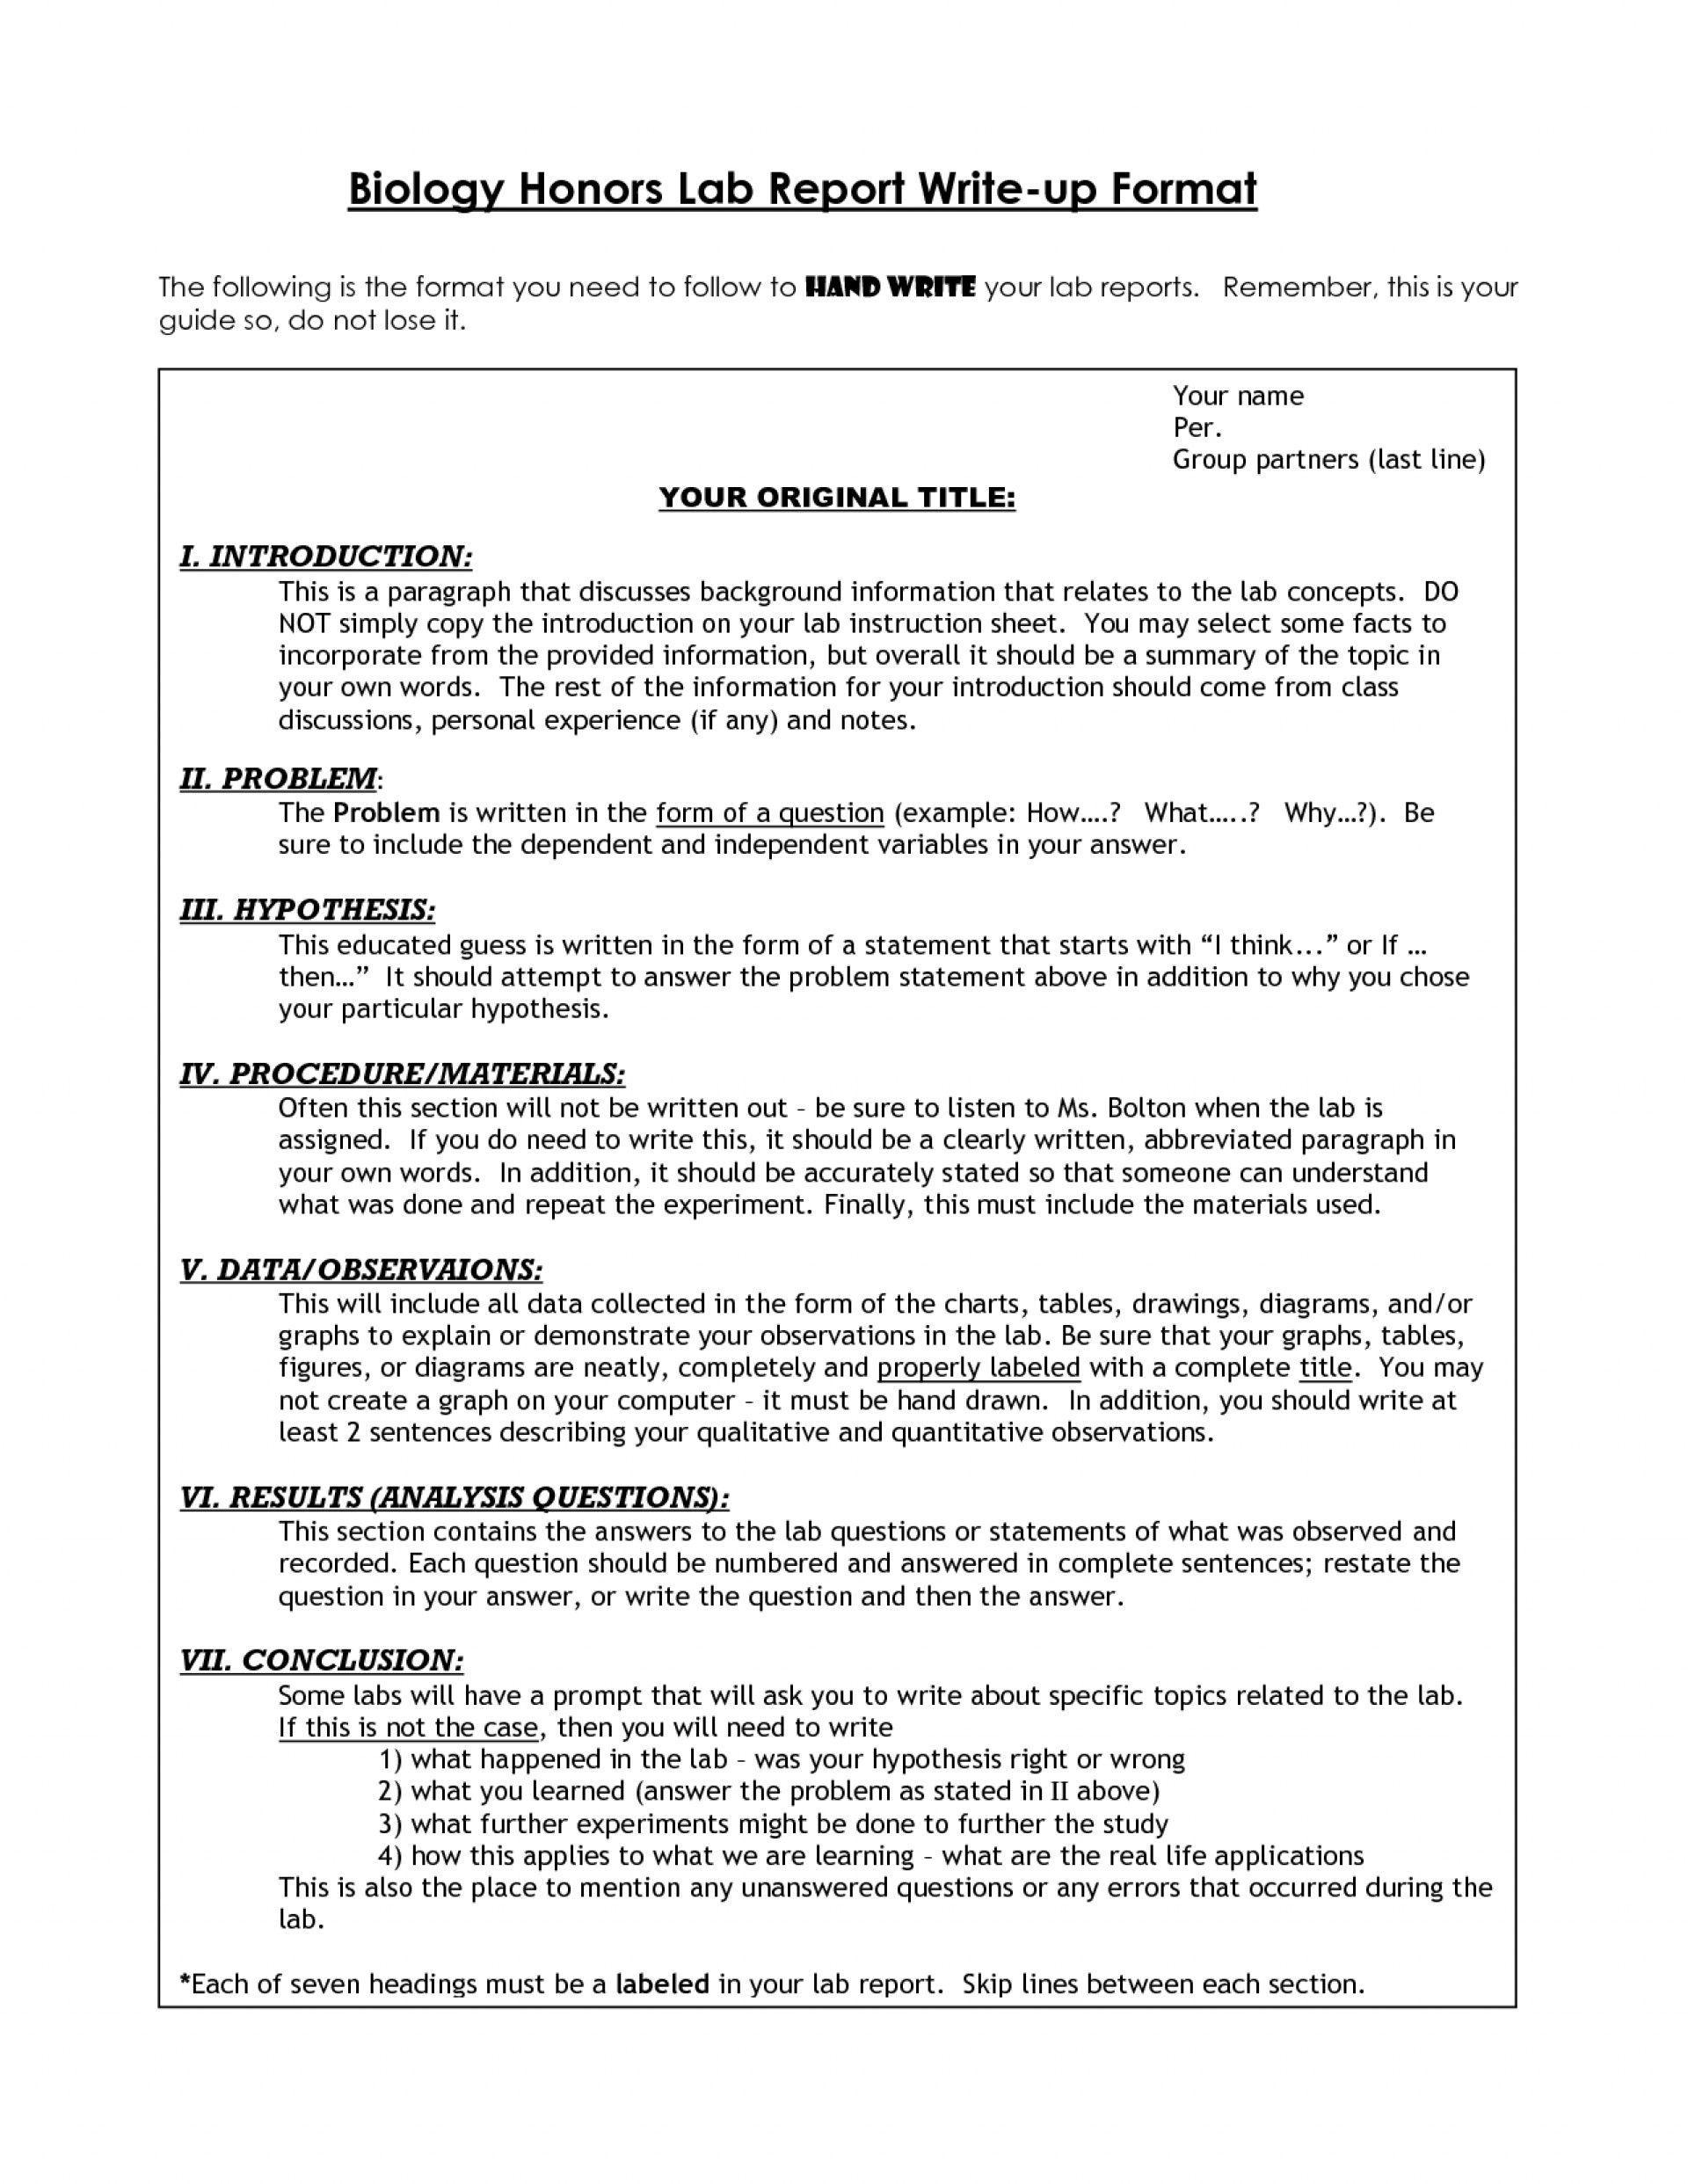 A free how resume to write